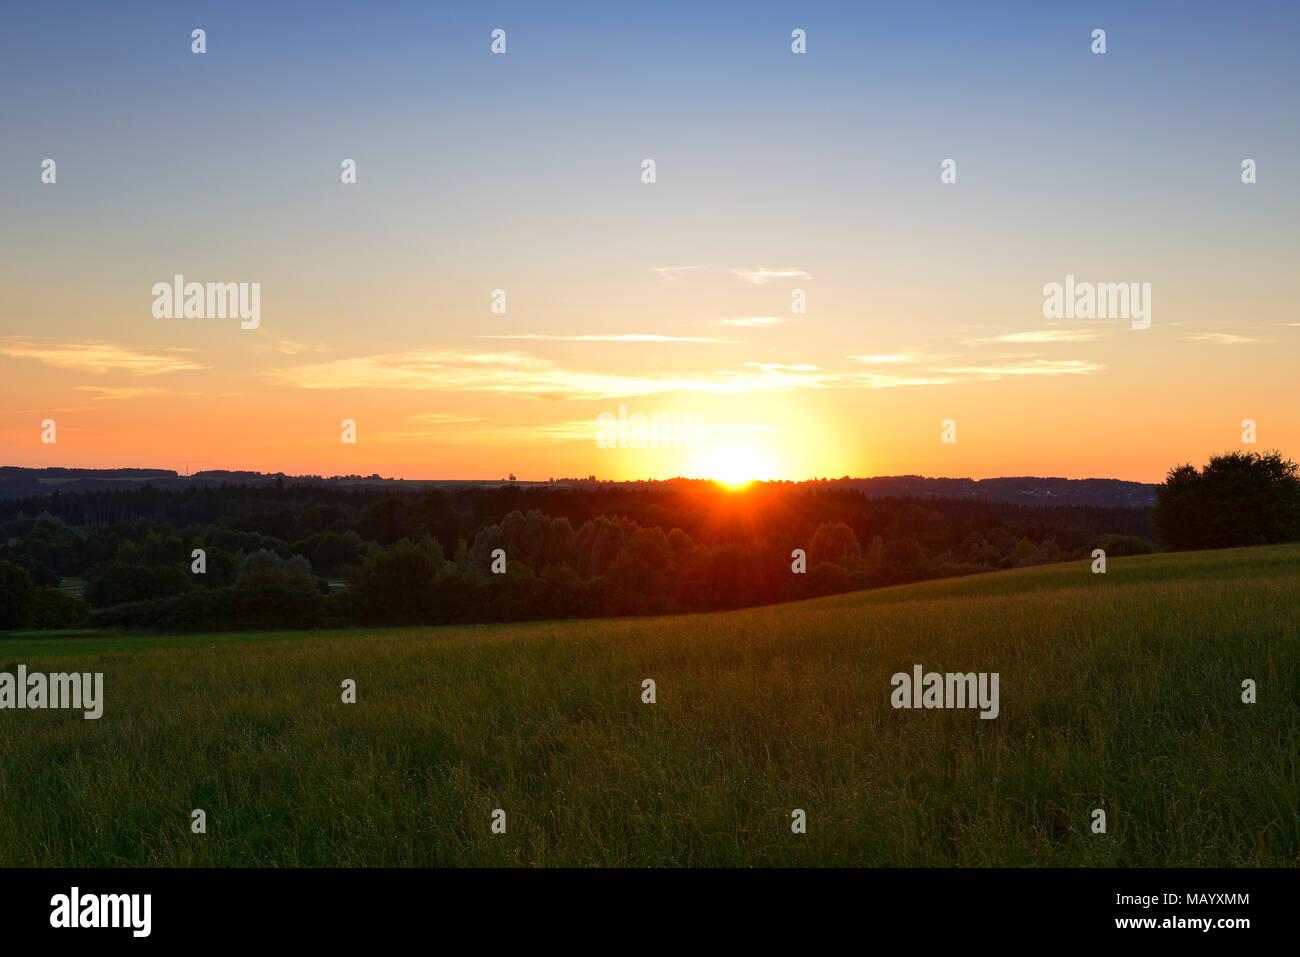 Sunset over the Pupplinger Au near Ergertshausen, municipality of Egling, Upper Bavaria, Bavaria, Germany - Stock Image